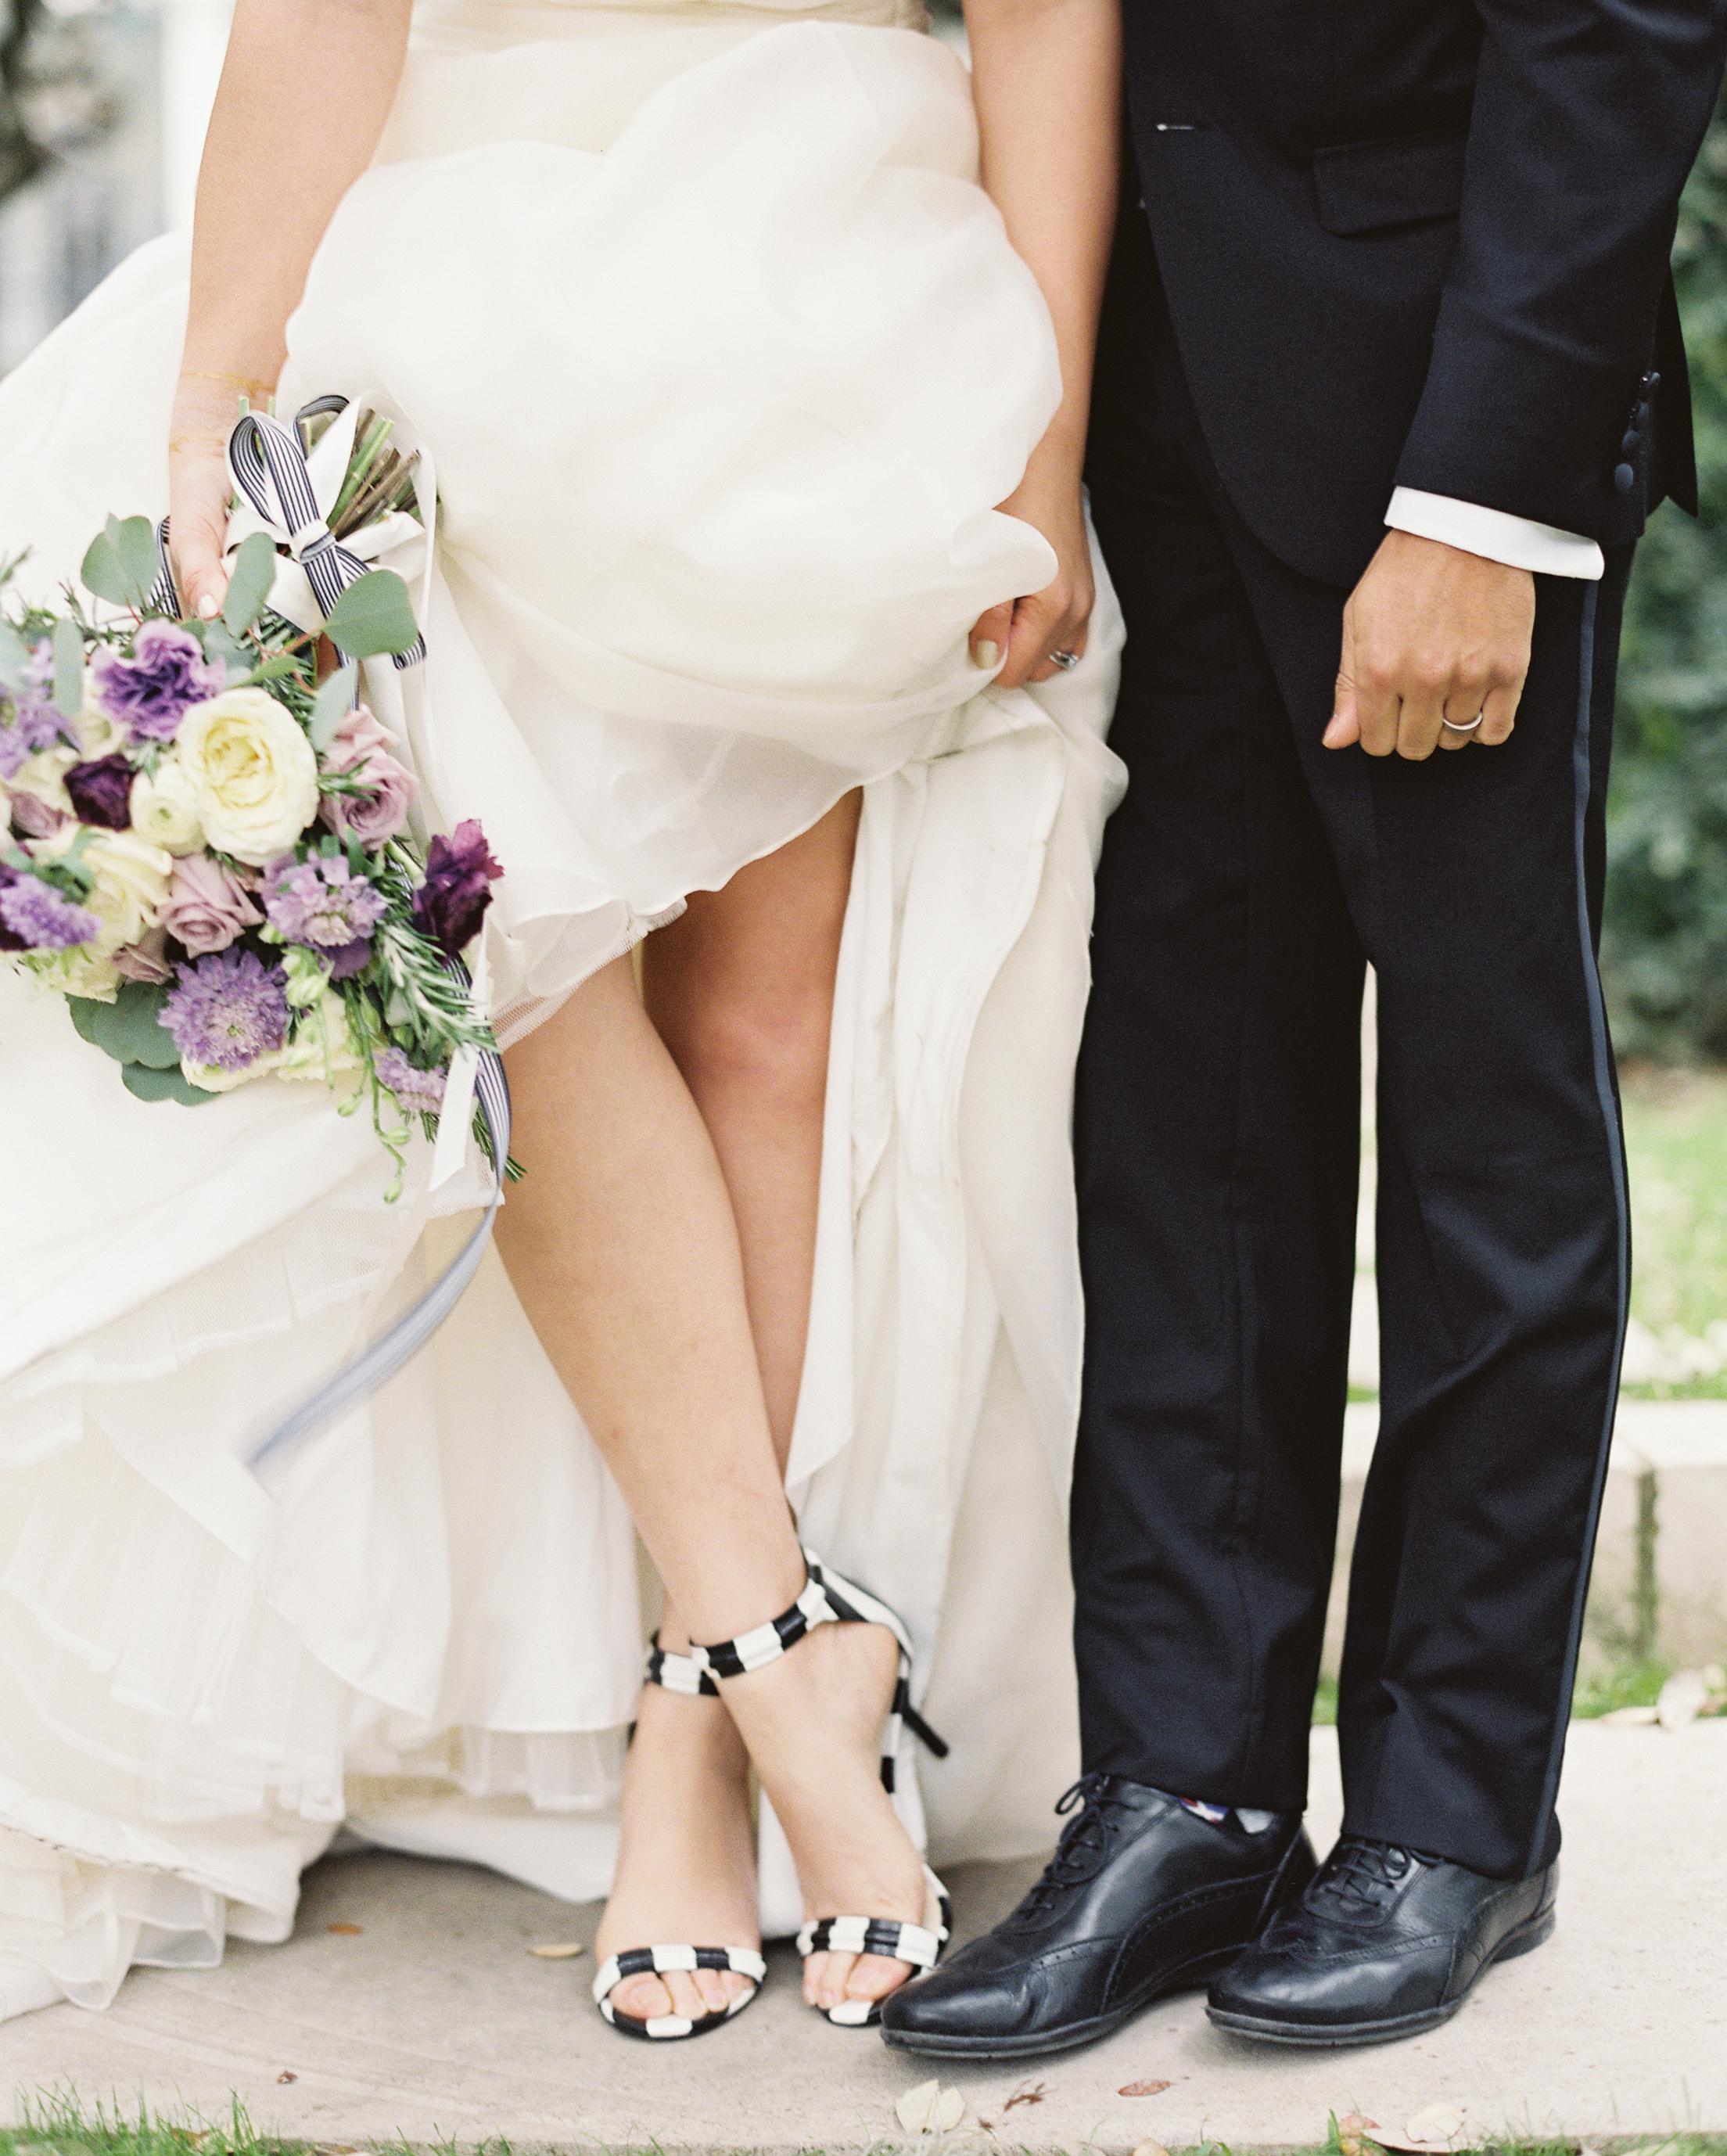 stacey-adam-wedding-shoes-0045-s112112-0815.jpg